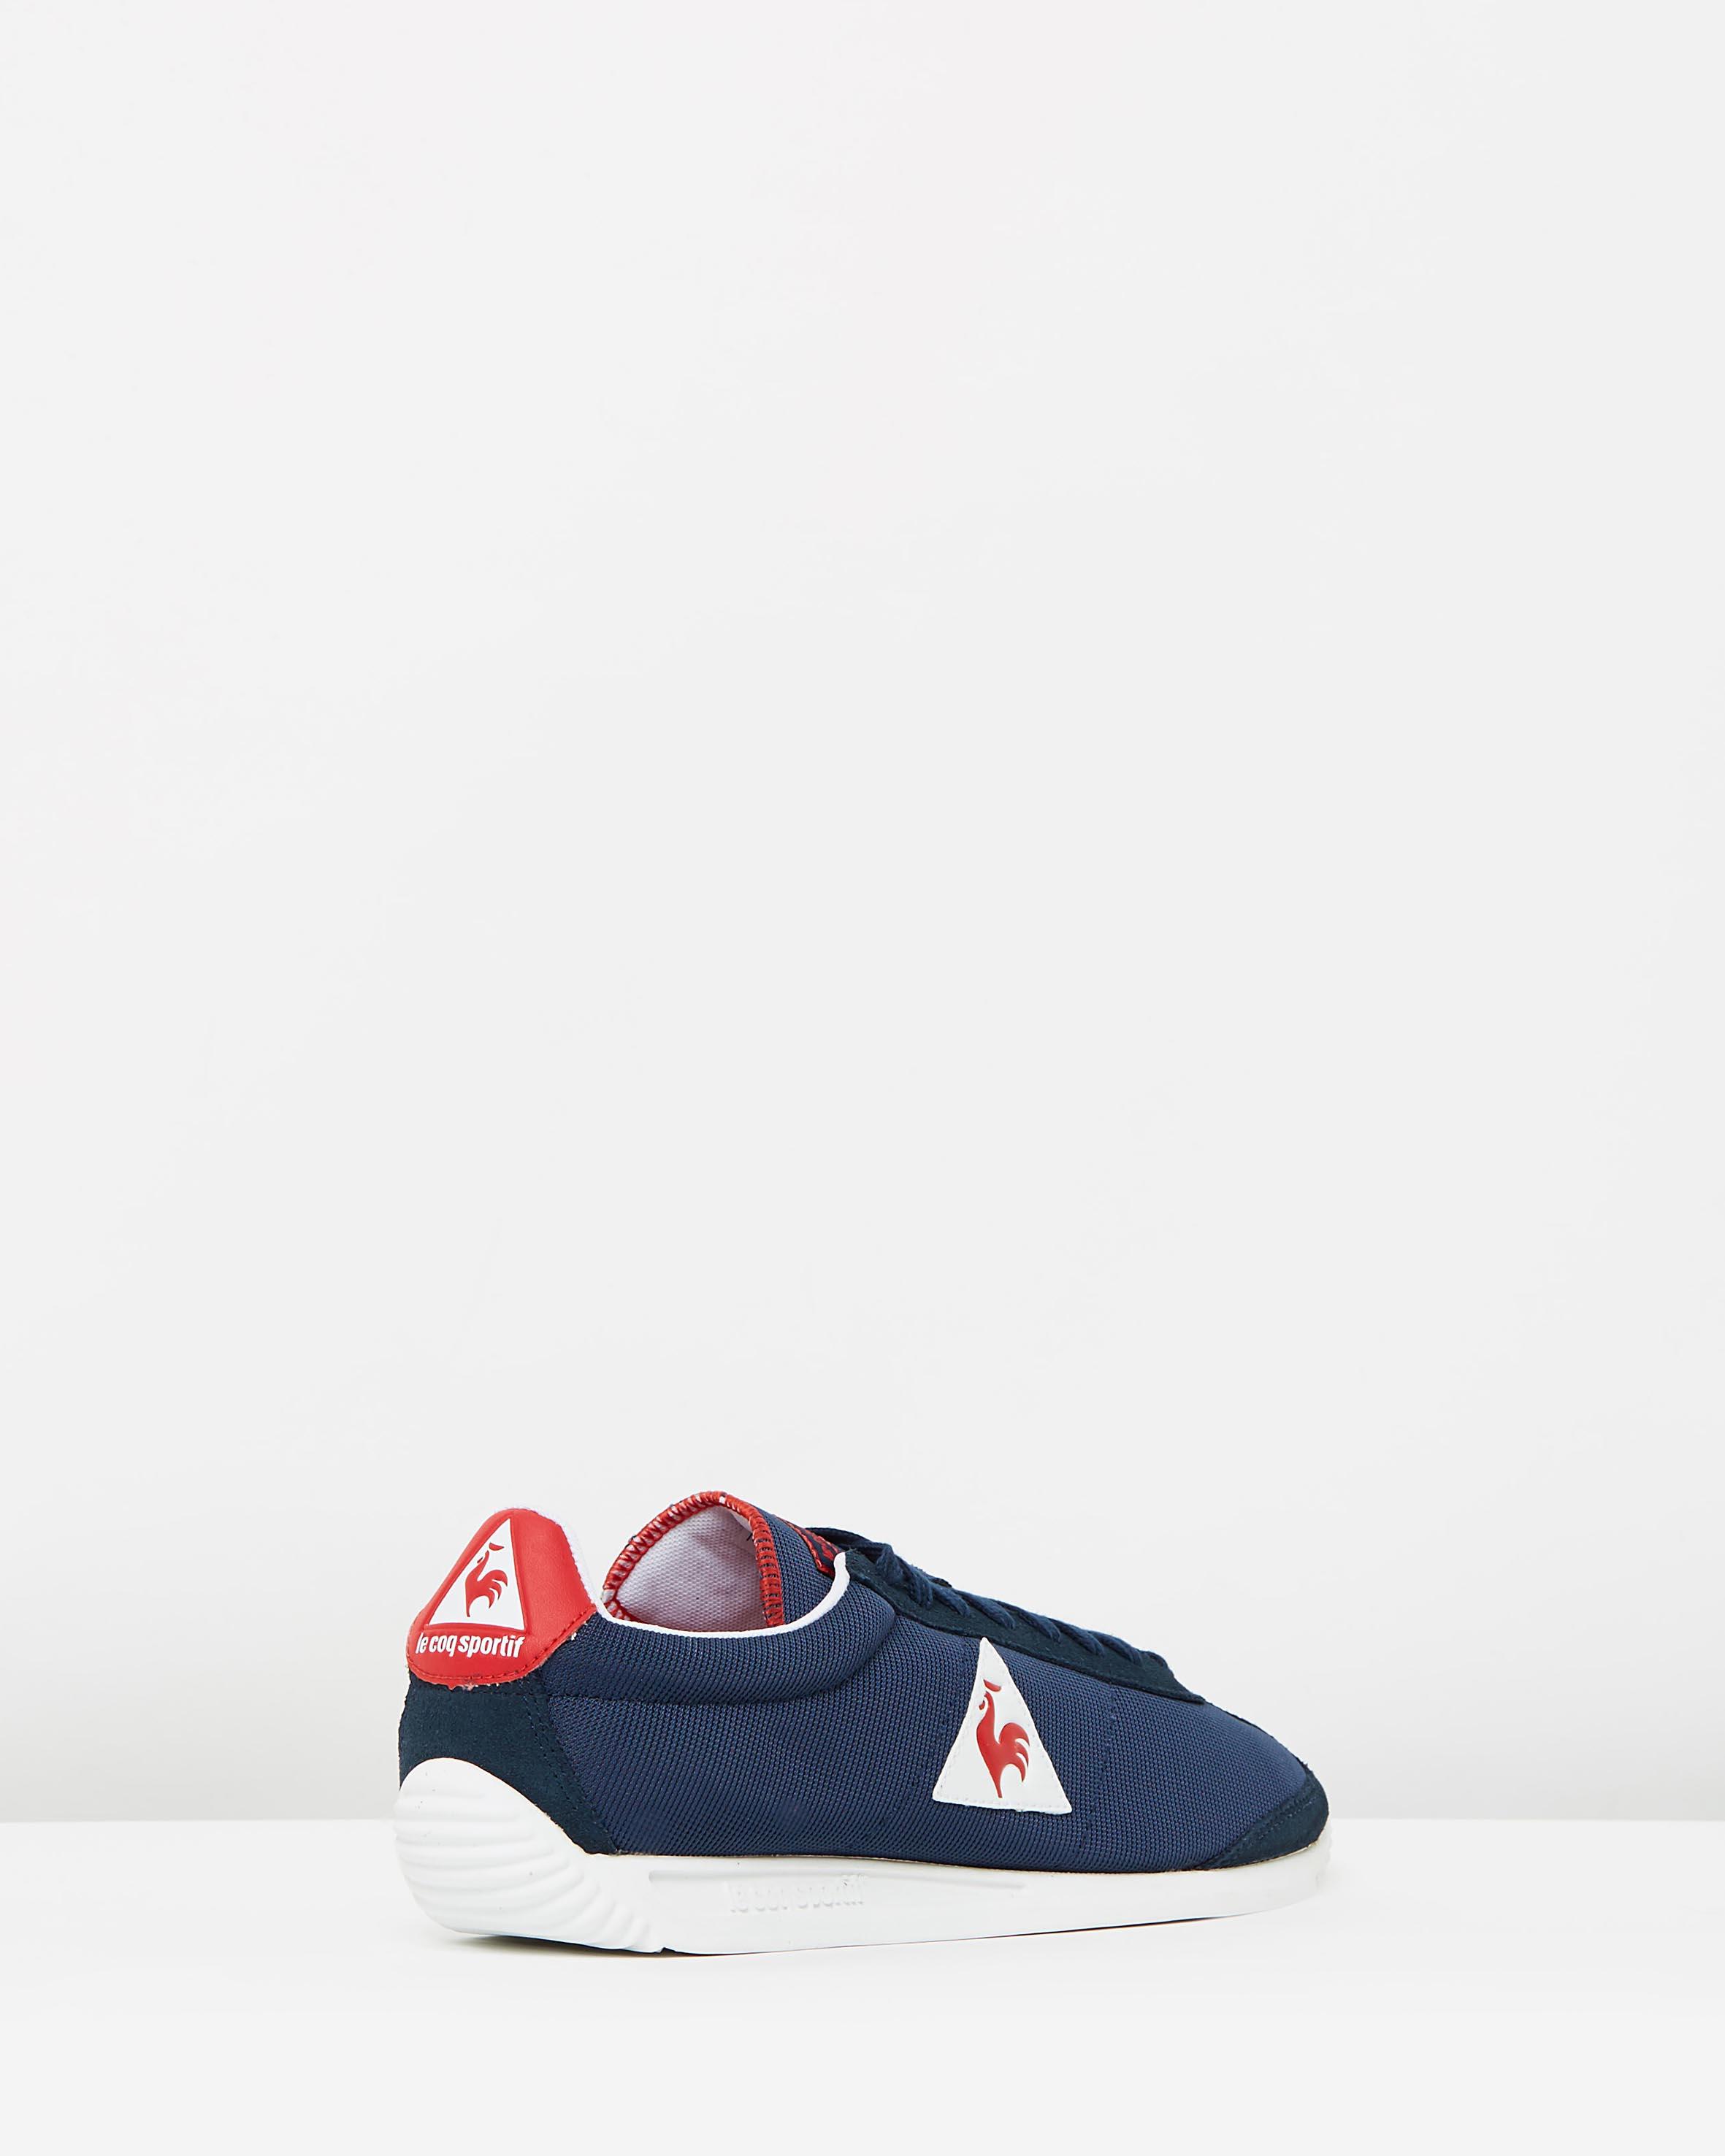 72d18f2ee01e ... Le Coq Sportif Quartz Nylon Sneakers In Dress Blue 2 ...